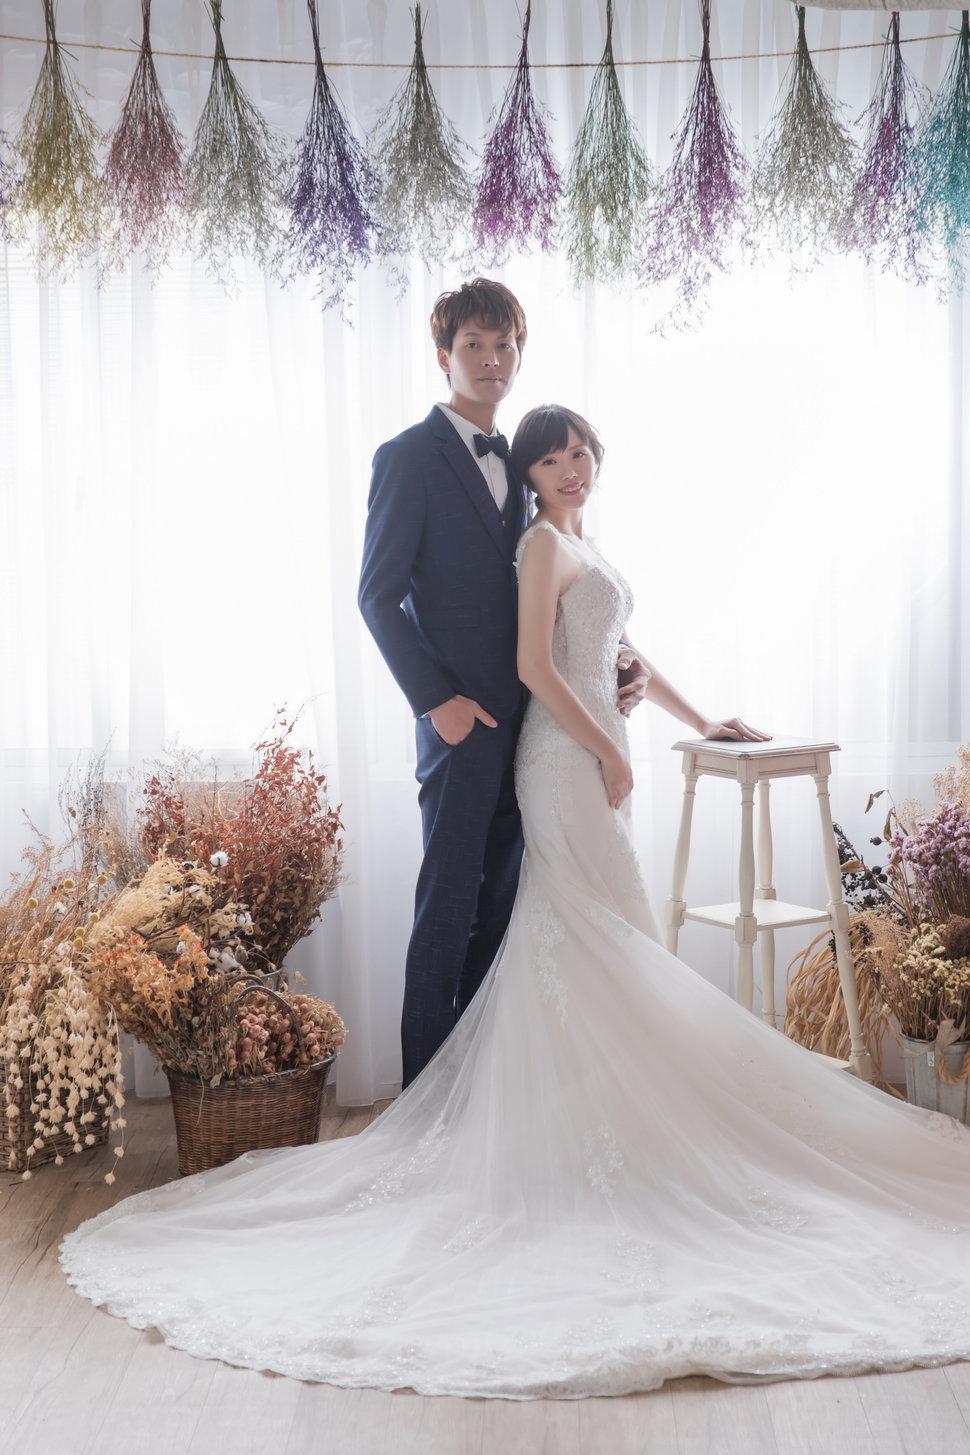 PP-0015_調整大小 - 巴黎婚紗攝影台灣總店《結婚吧》